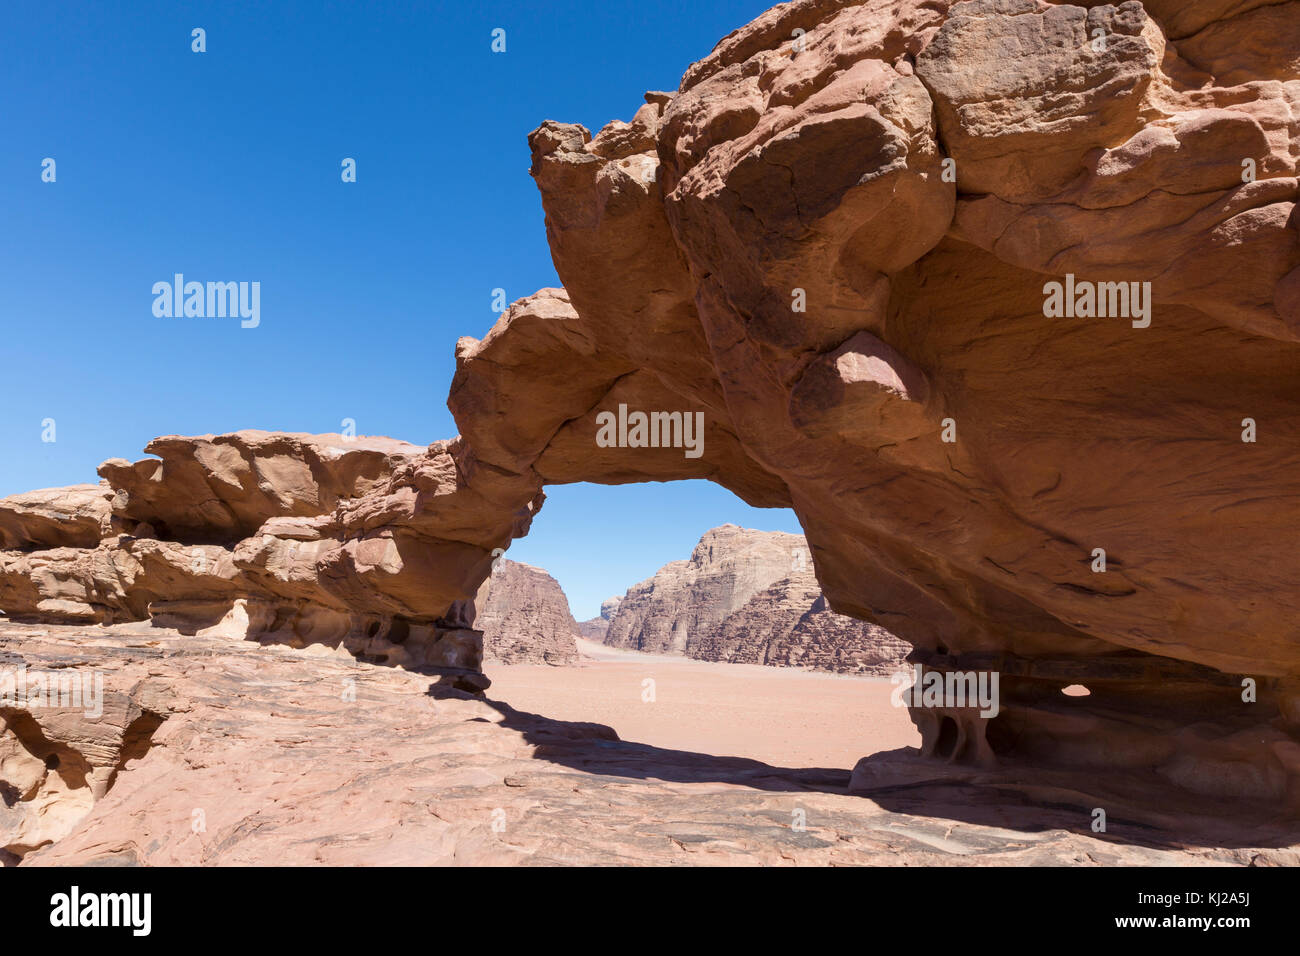 Ponte di roccia naturale e vista panoramica di Wadi Rum desert, Giordania Immagini Stock